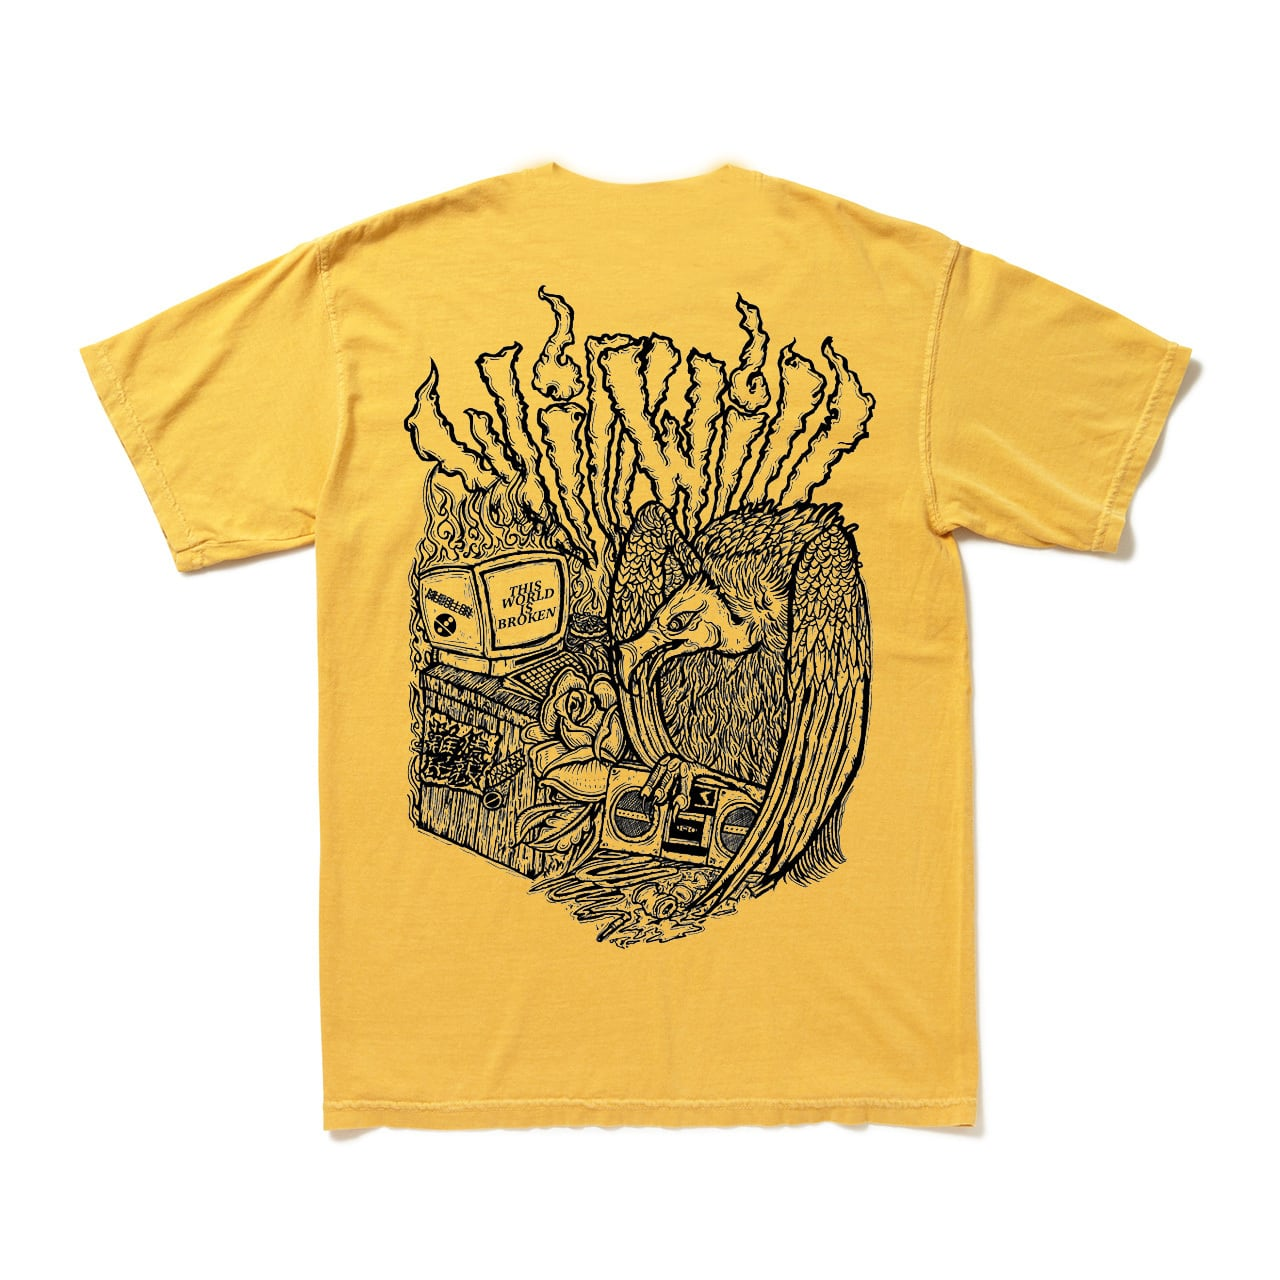 【WillxWill × Musollon】スペシャルコラボレーション Vulture T-shirtsYellow